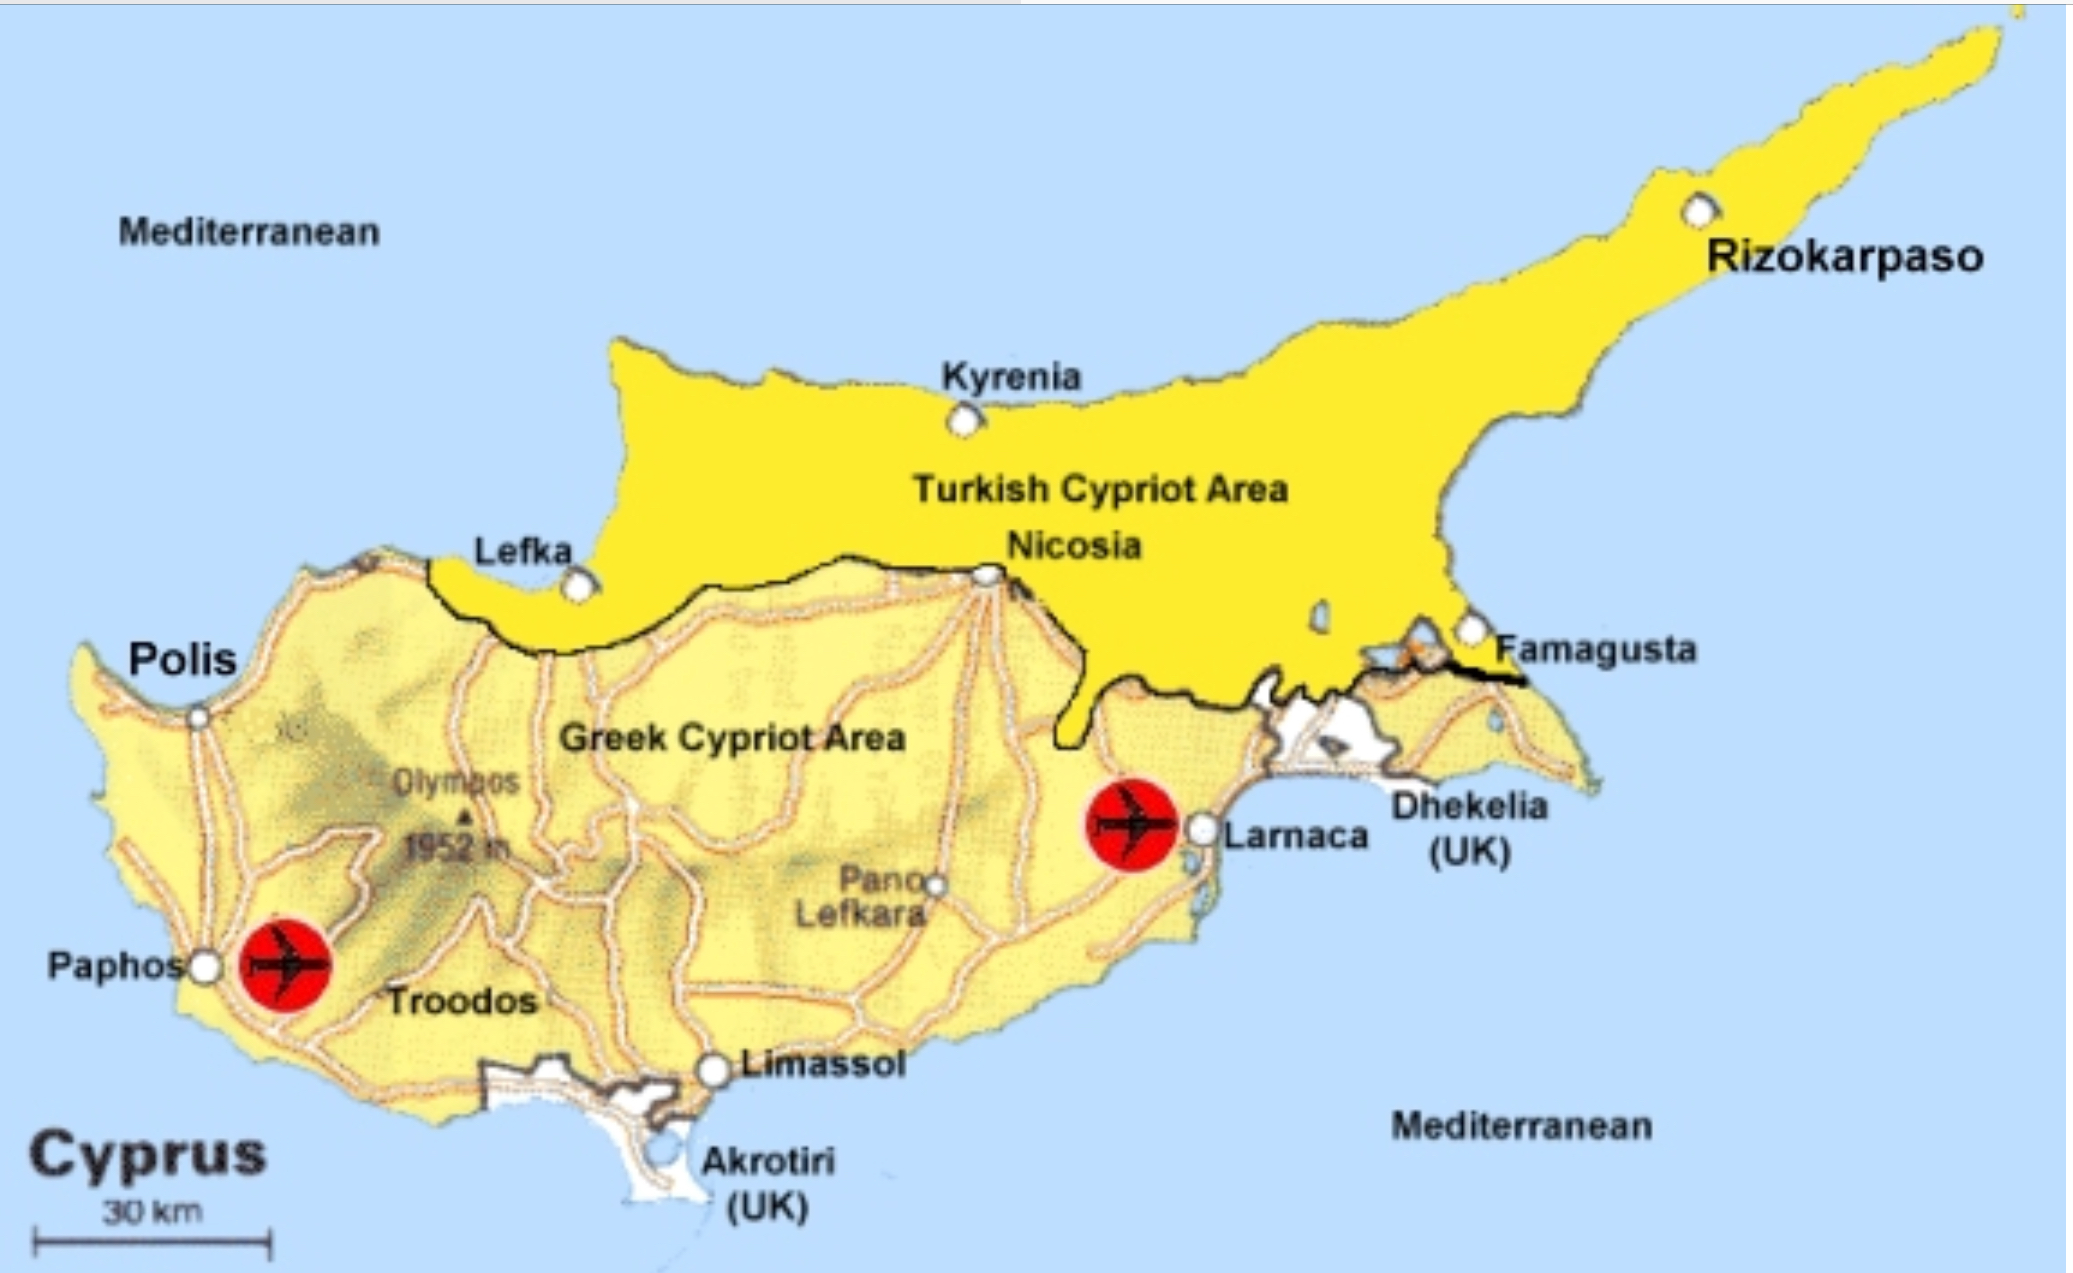 Roaming in turkey and cyprus on payg o2 community 10fae401 8e06 4f52 8ef5 375376dcb26aeg gumiabroncs Choice Image